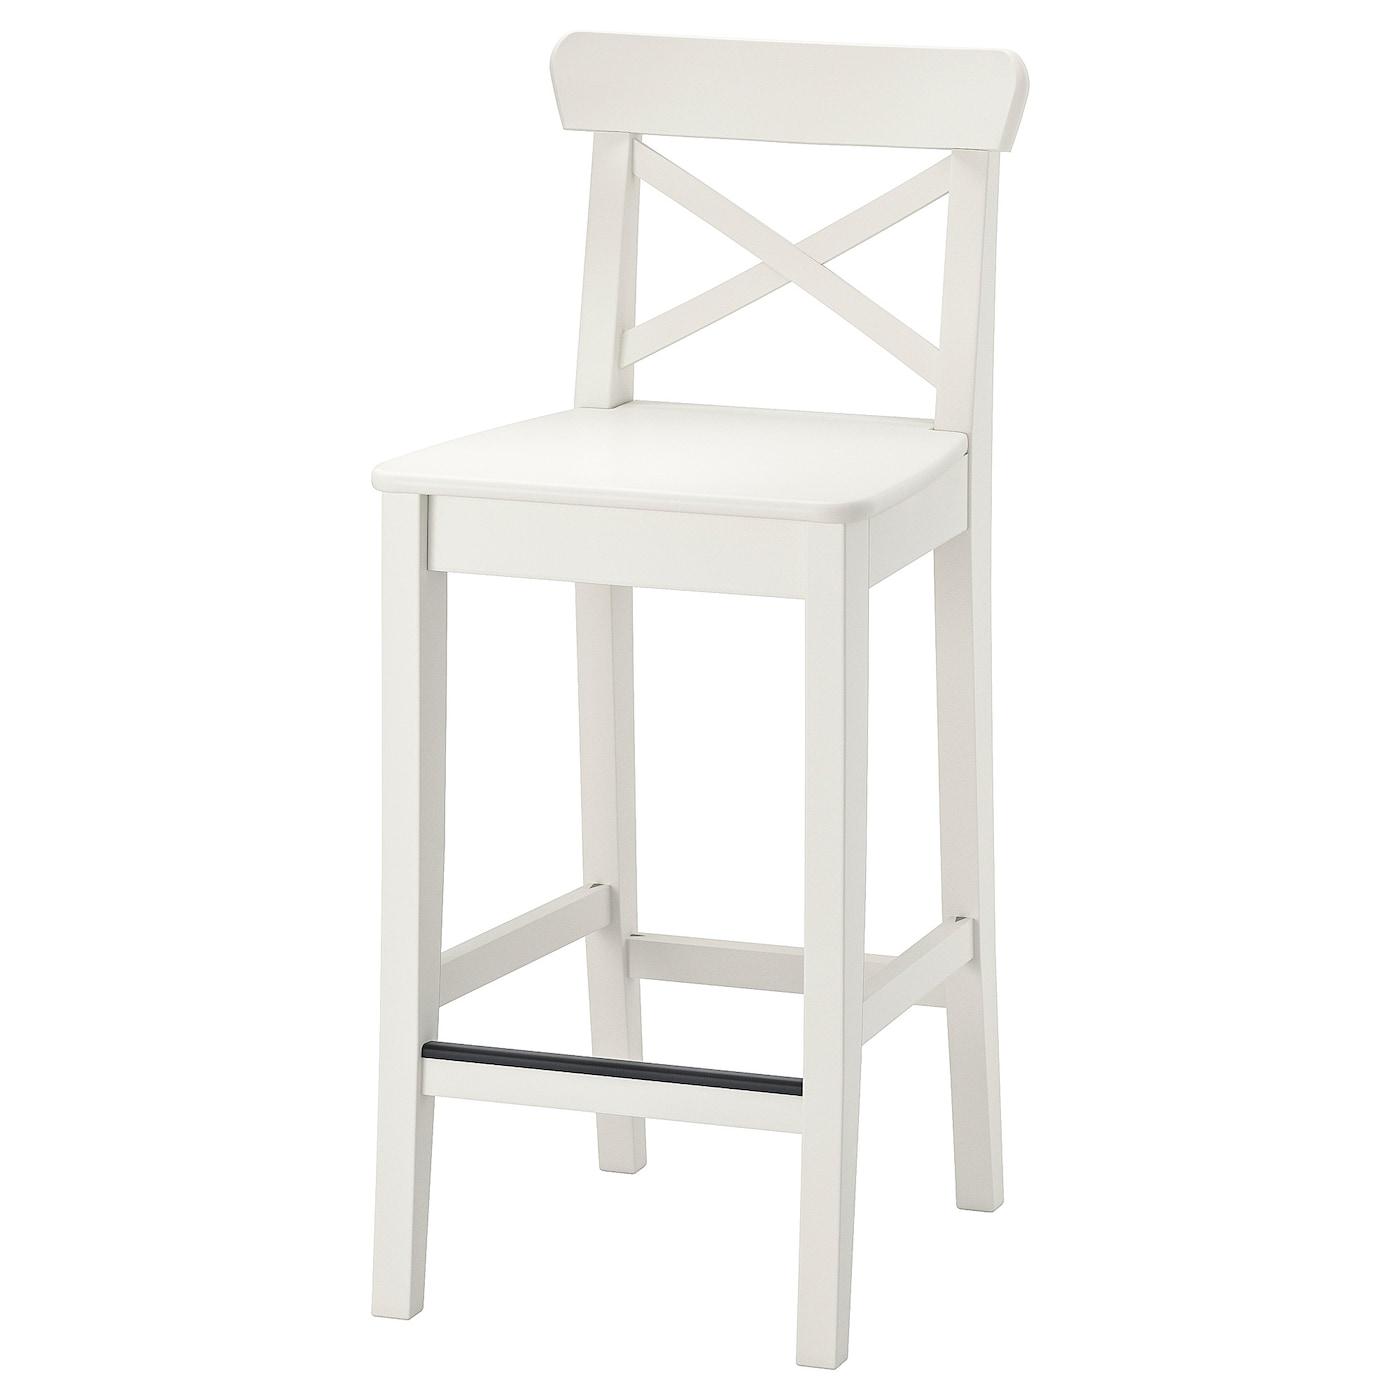 INGOLF Bar stool with backrest   white 9 cm